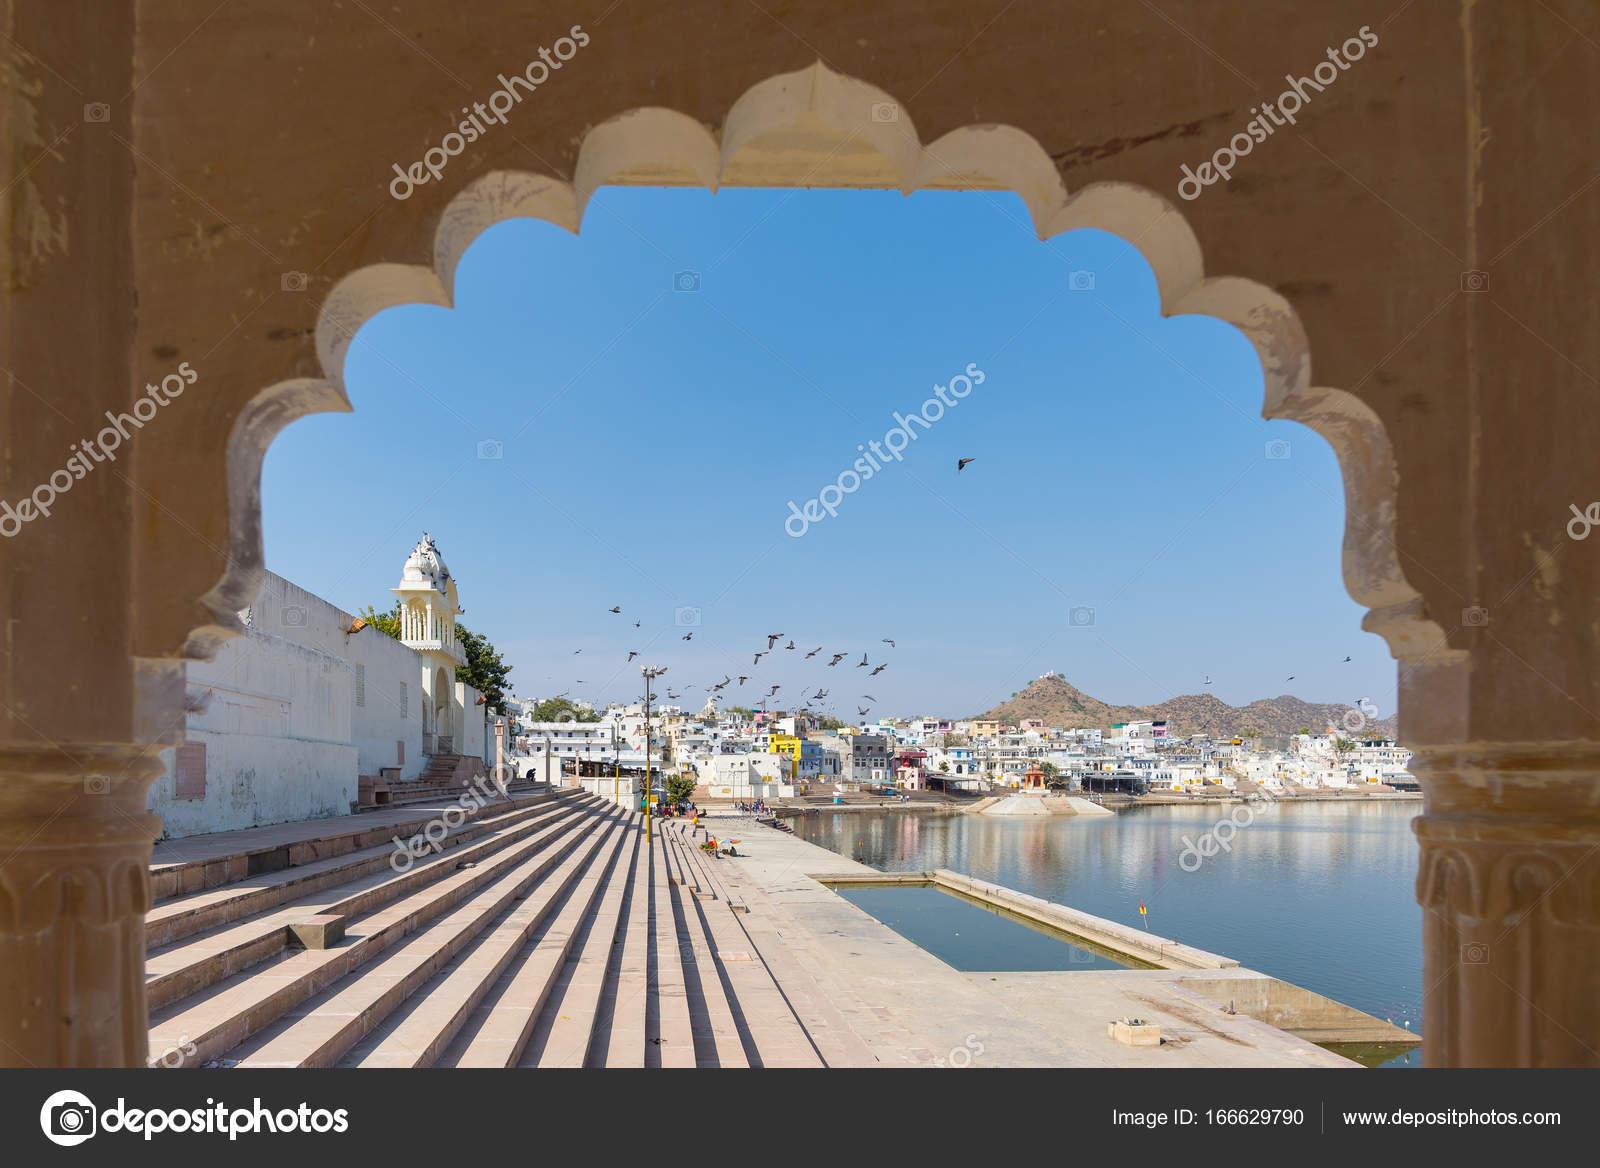 Gerahmte Blick vom Torbogen am Pushkar, Rajasthan, Indien. Tempel ...